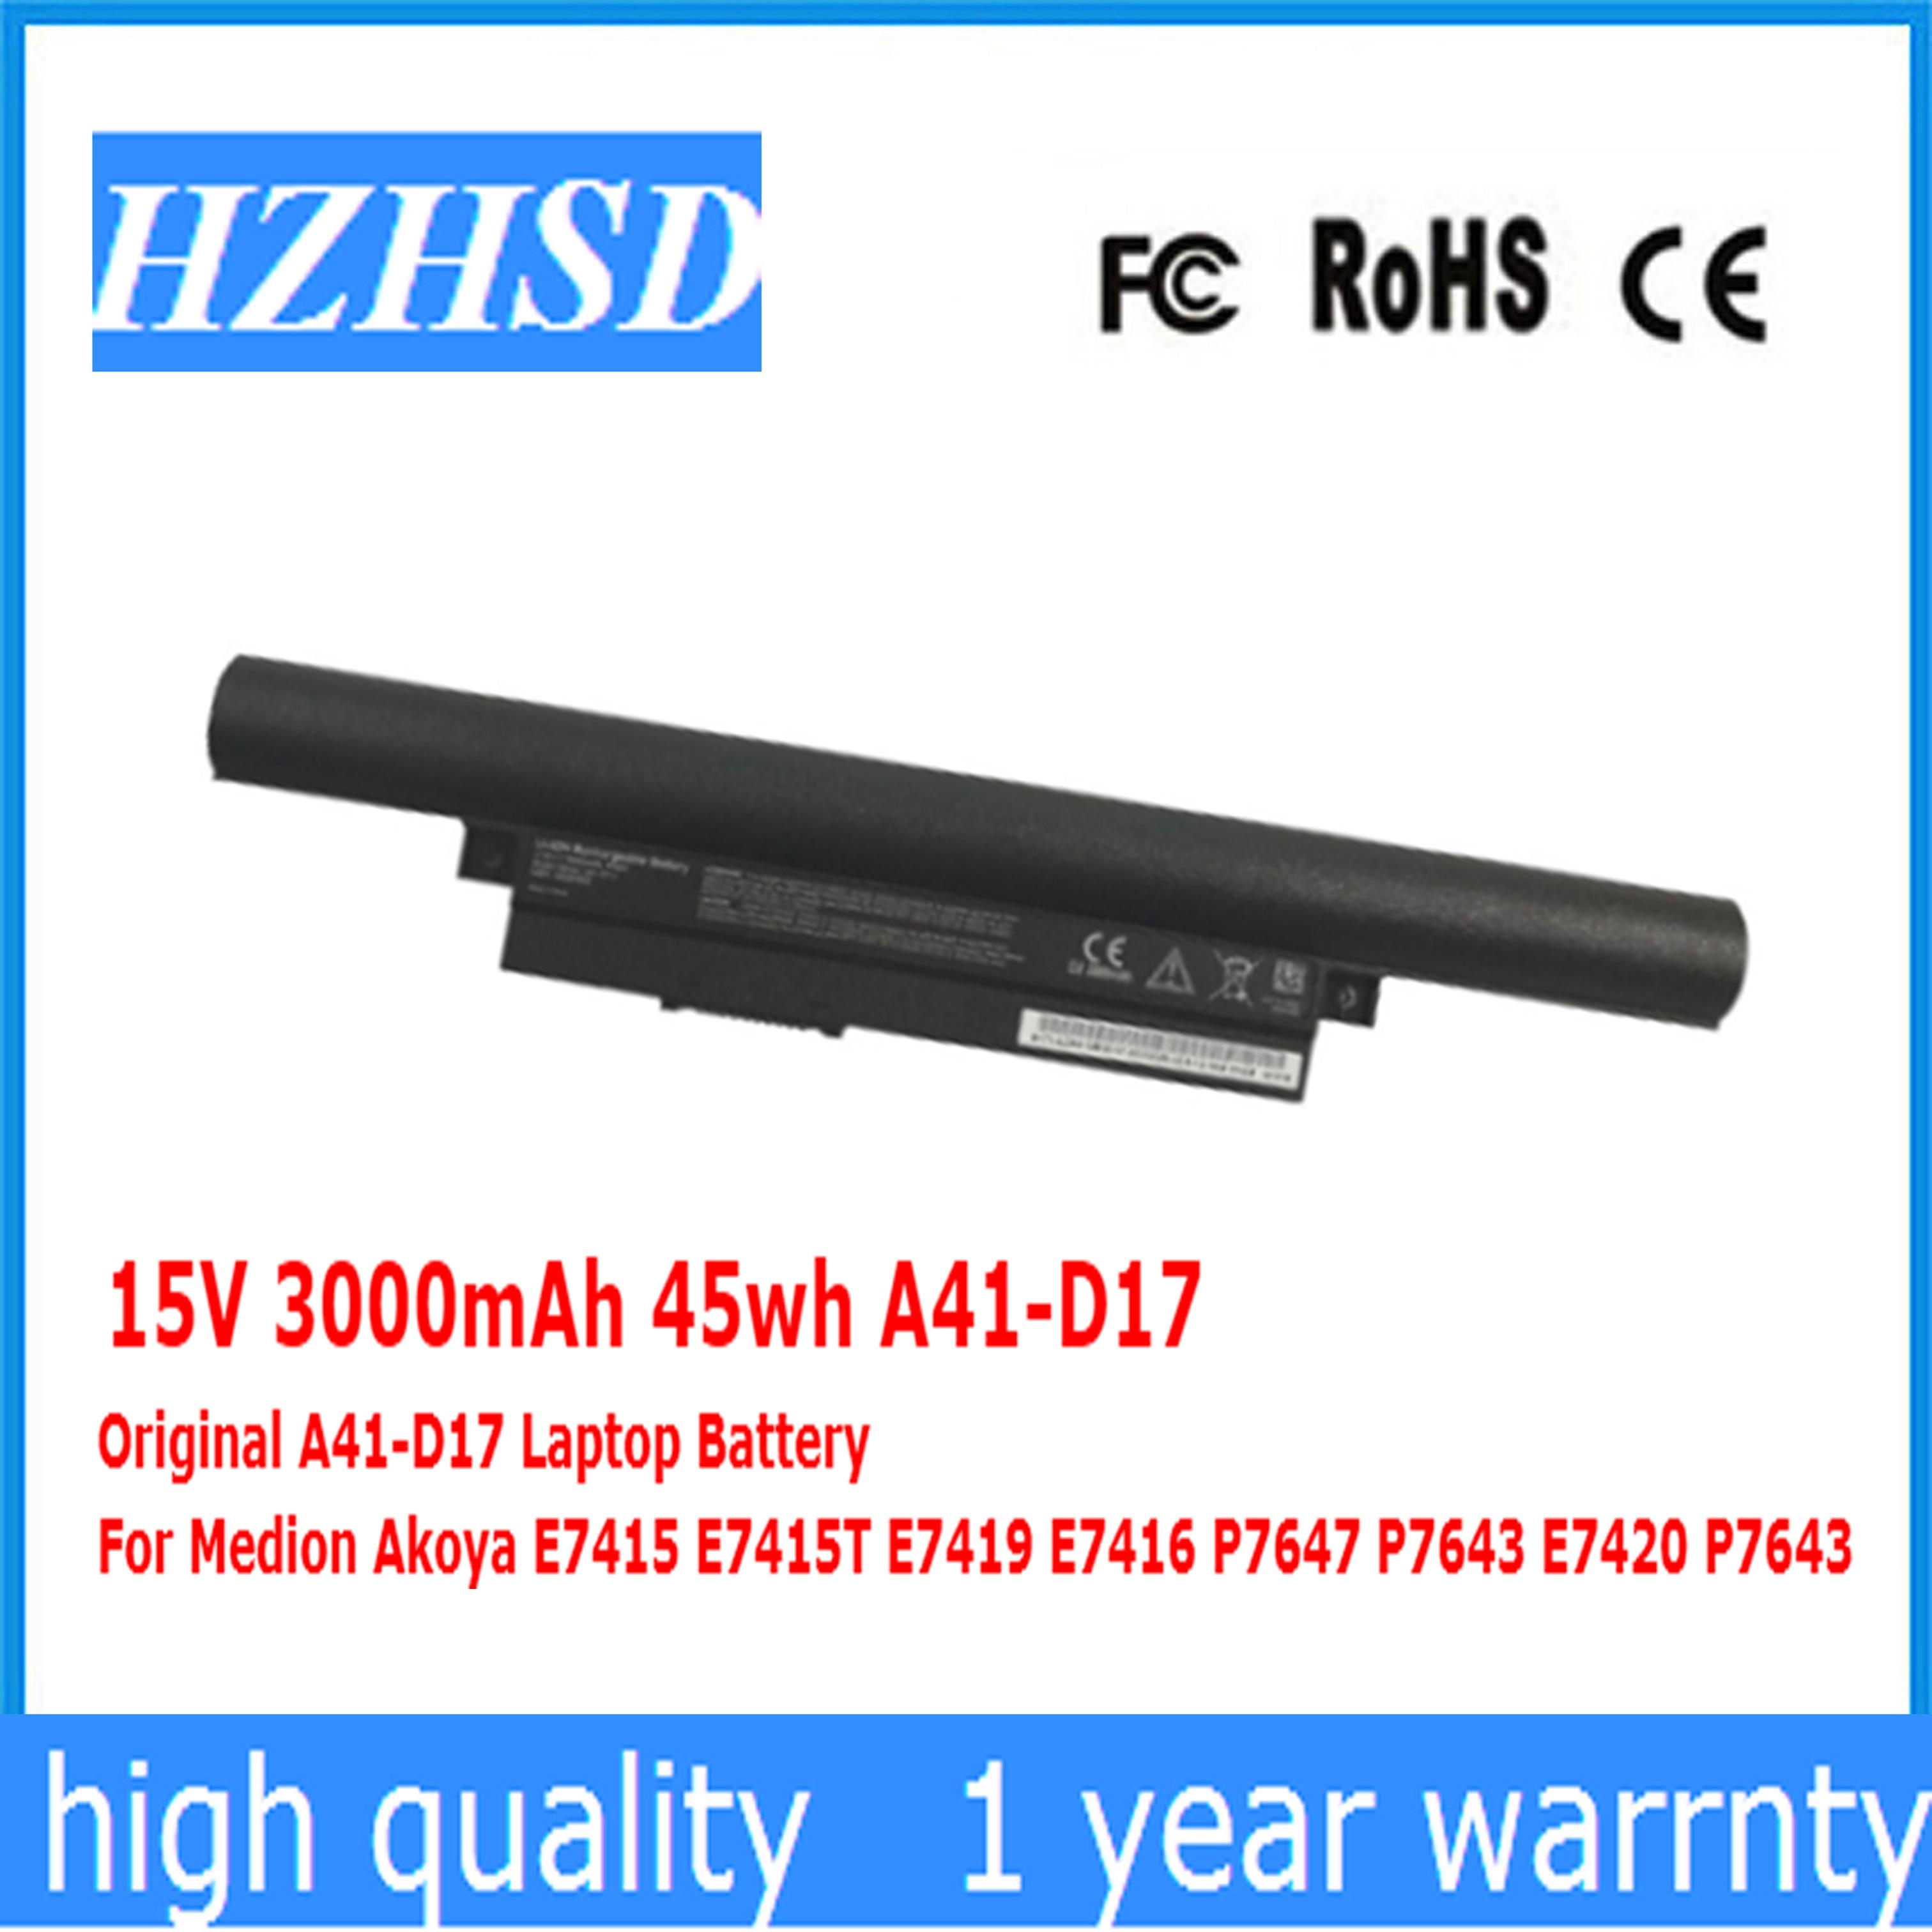 15 в 3000 мАч 45wh A41-D17 оригинальный A41-D17 Аккумулятор для ноутбука Medion Akoya E7415 E7415T E7419 E7416 P7647 P7643 E7420 P7643